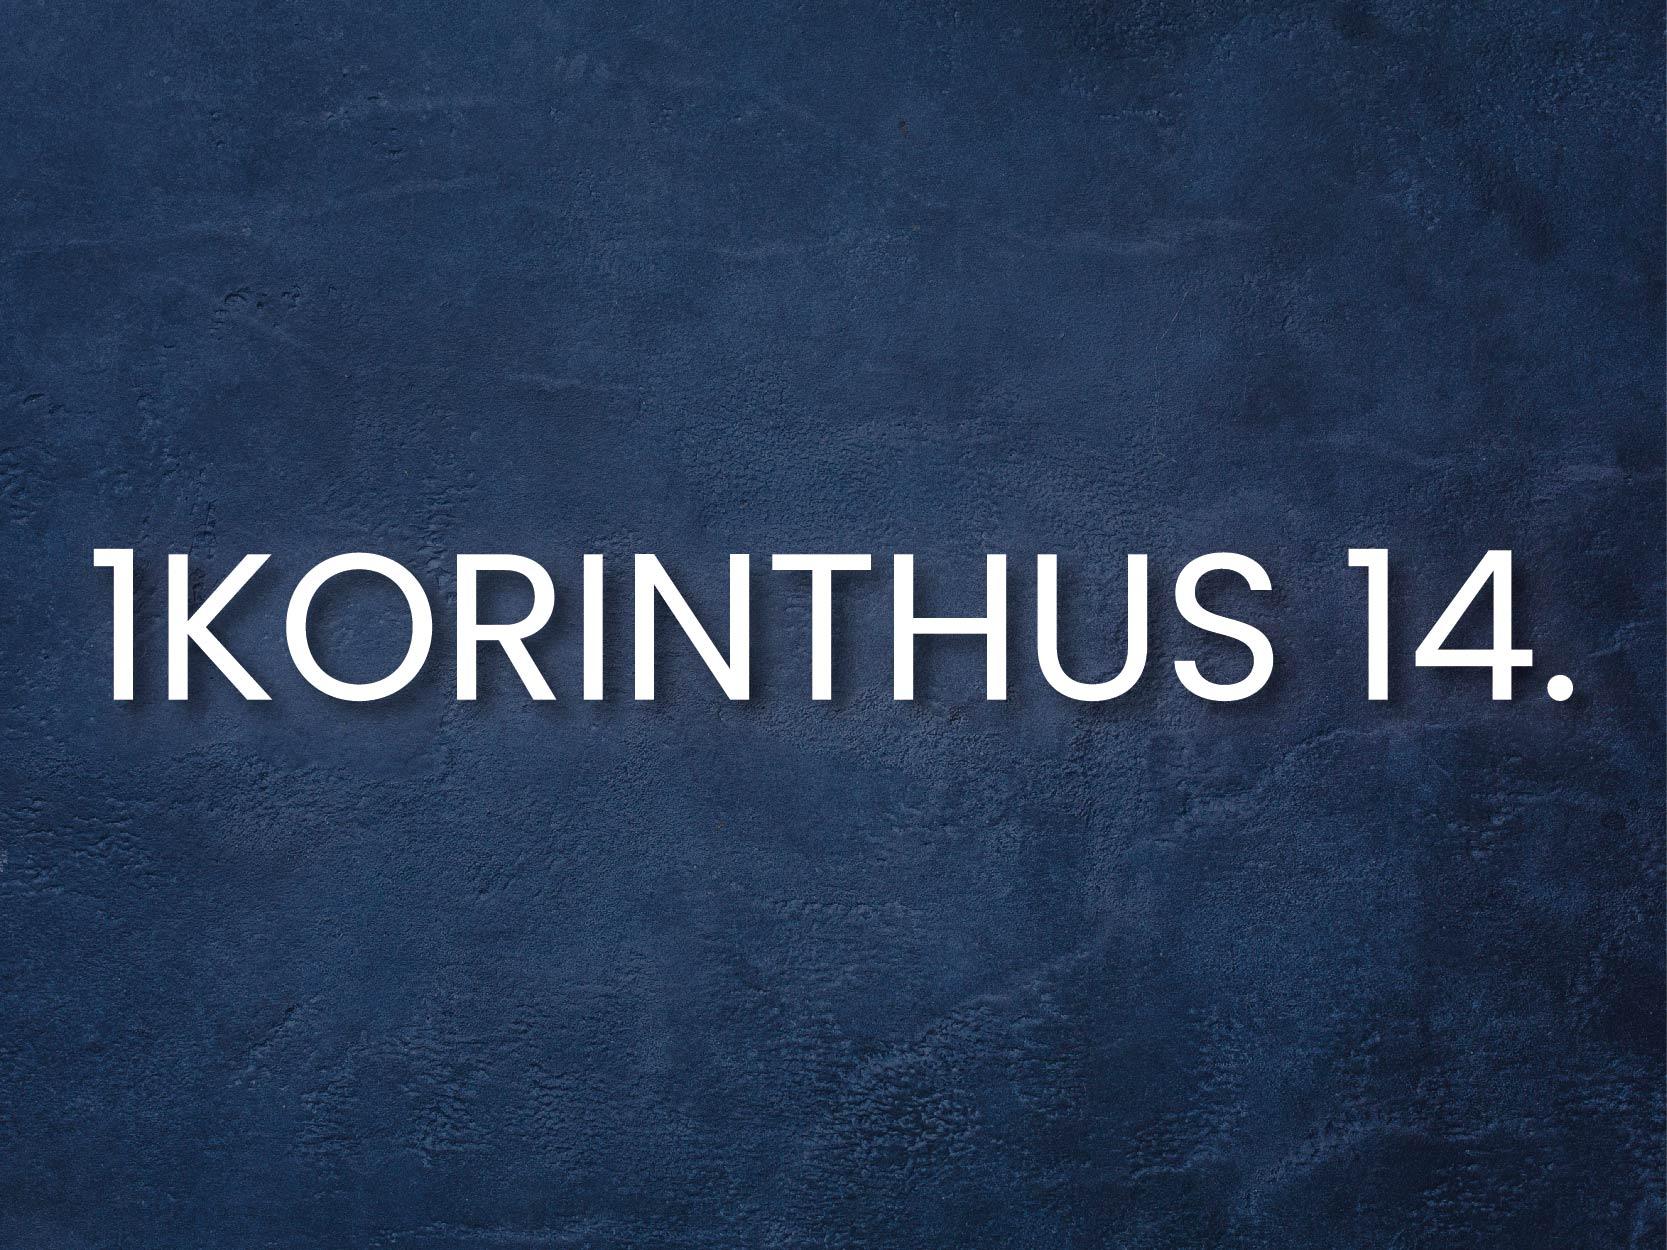 INFO_korinthus_14